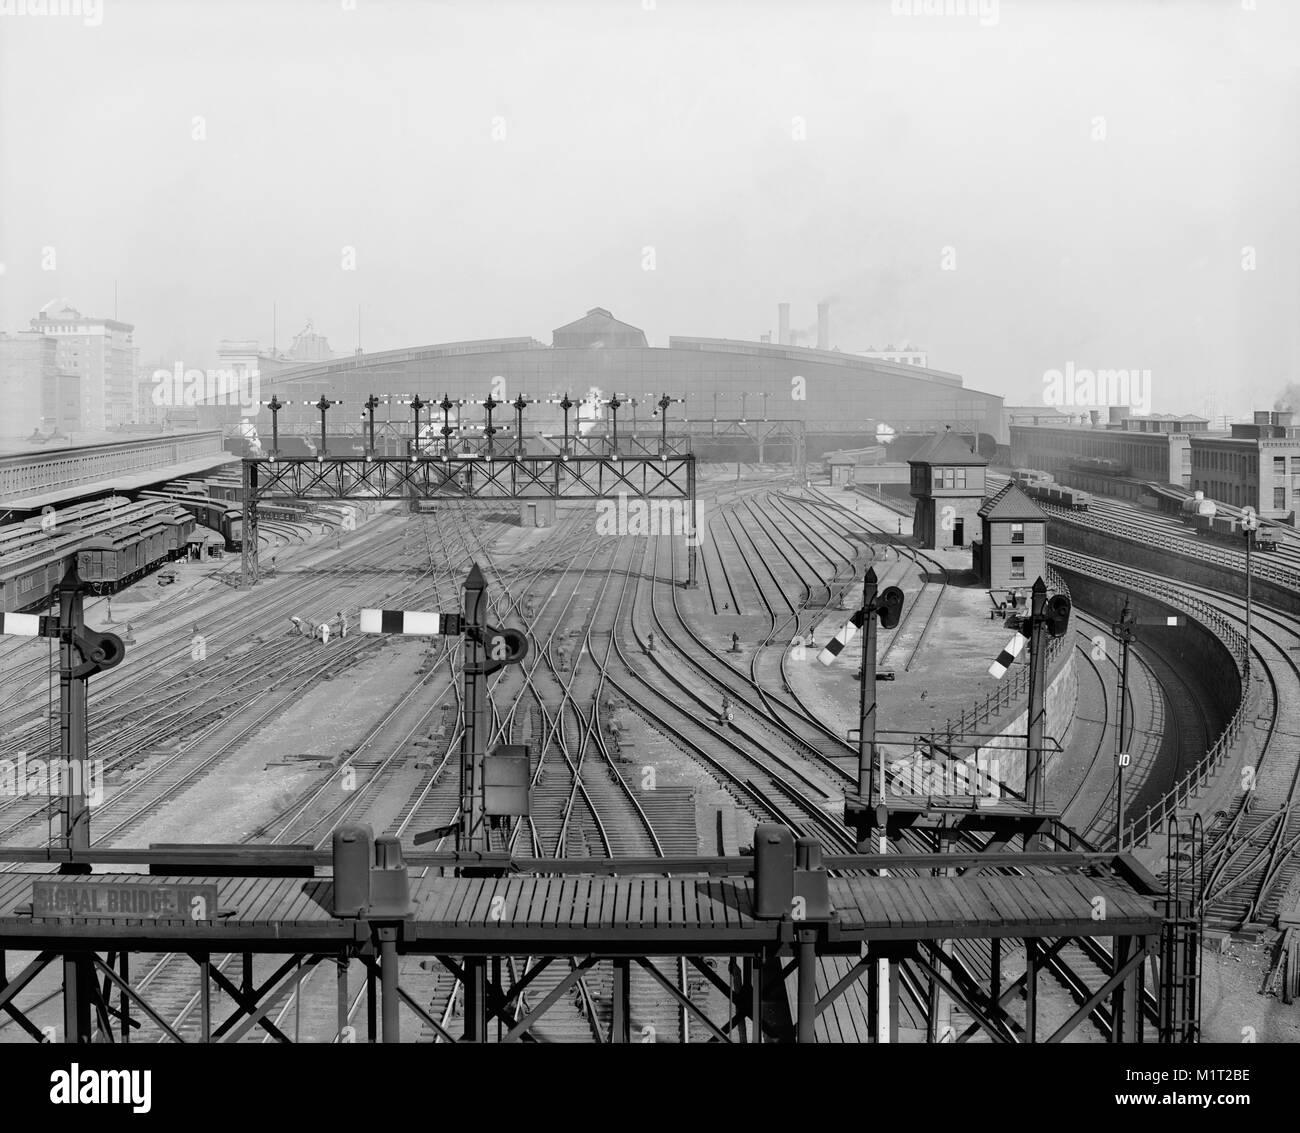 Rail Yards and Tracks, South Terminal Station, Boston, Massachusetts, USA, Detroit Publishing Company, 1904 - Stock Image